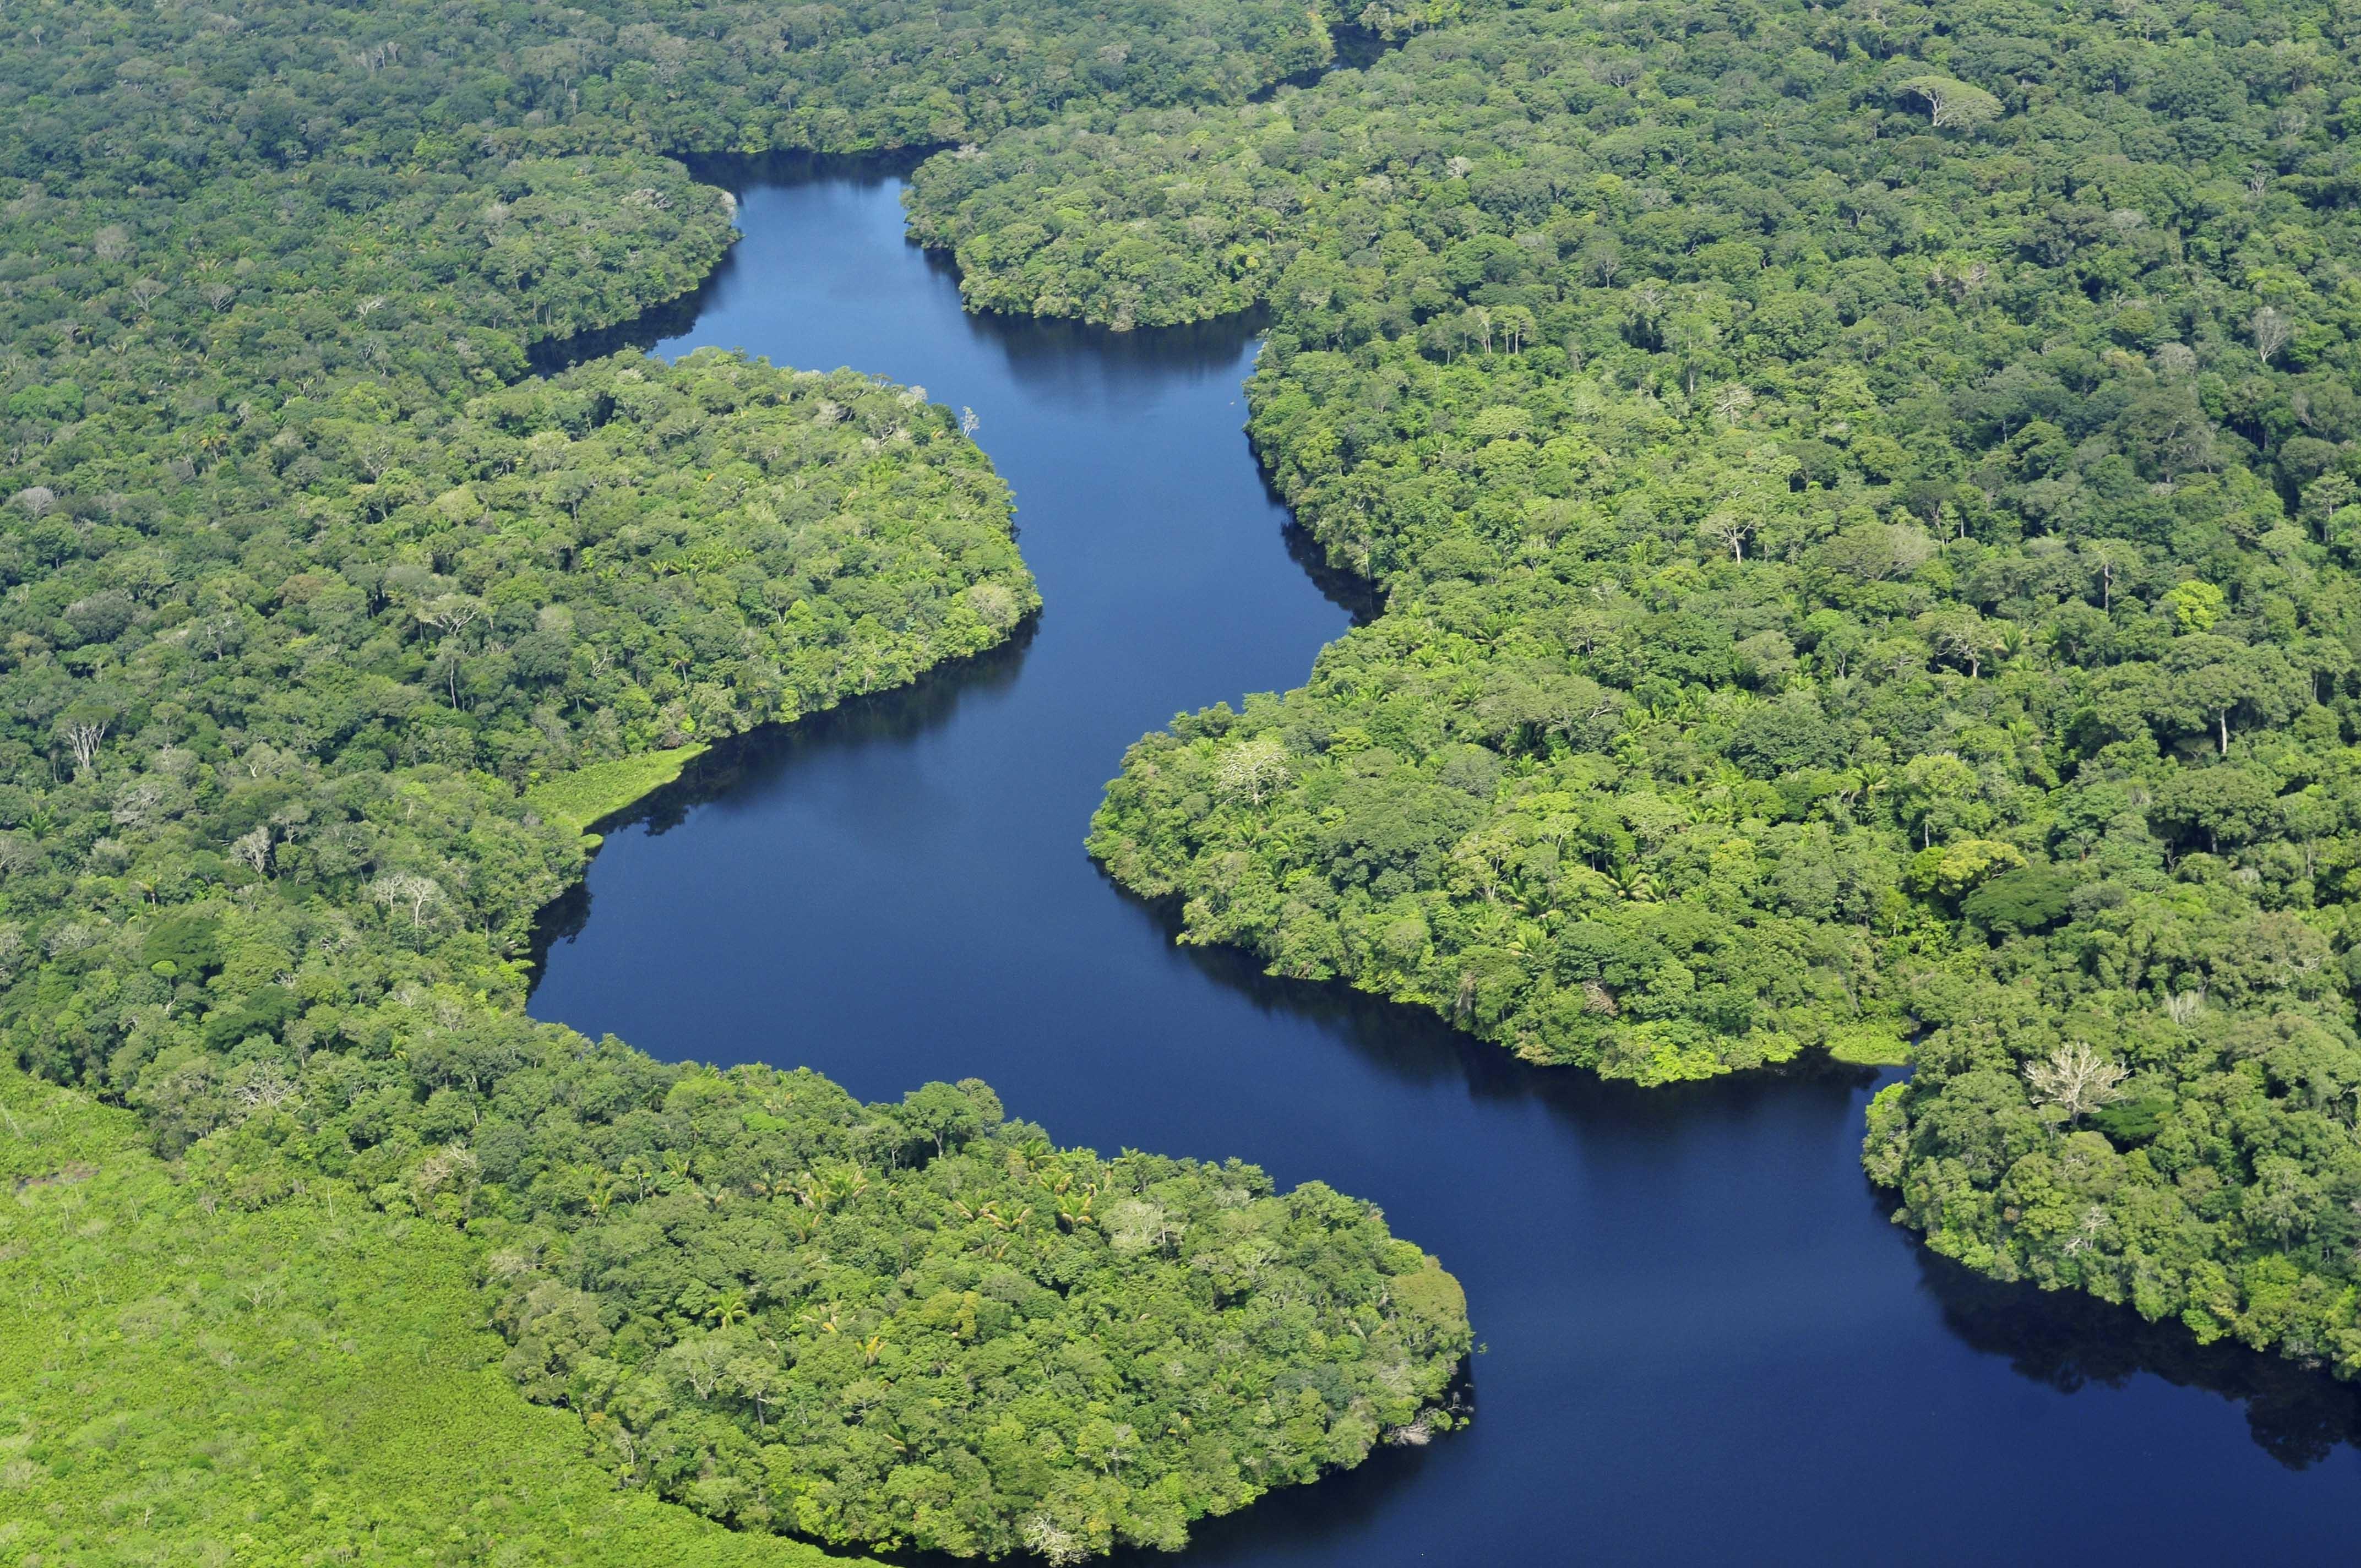 amazon rainforest south america - photo #27